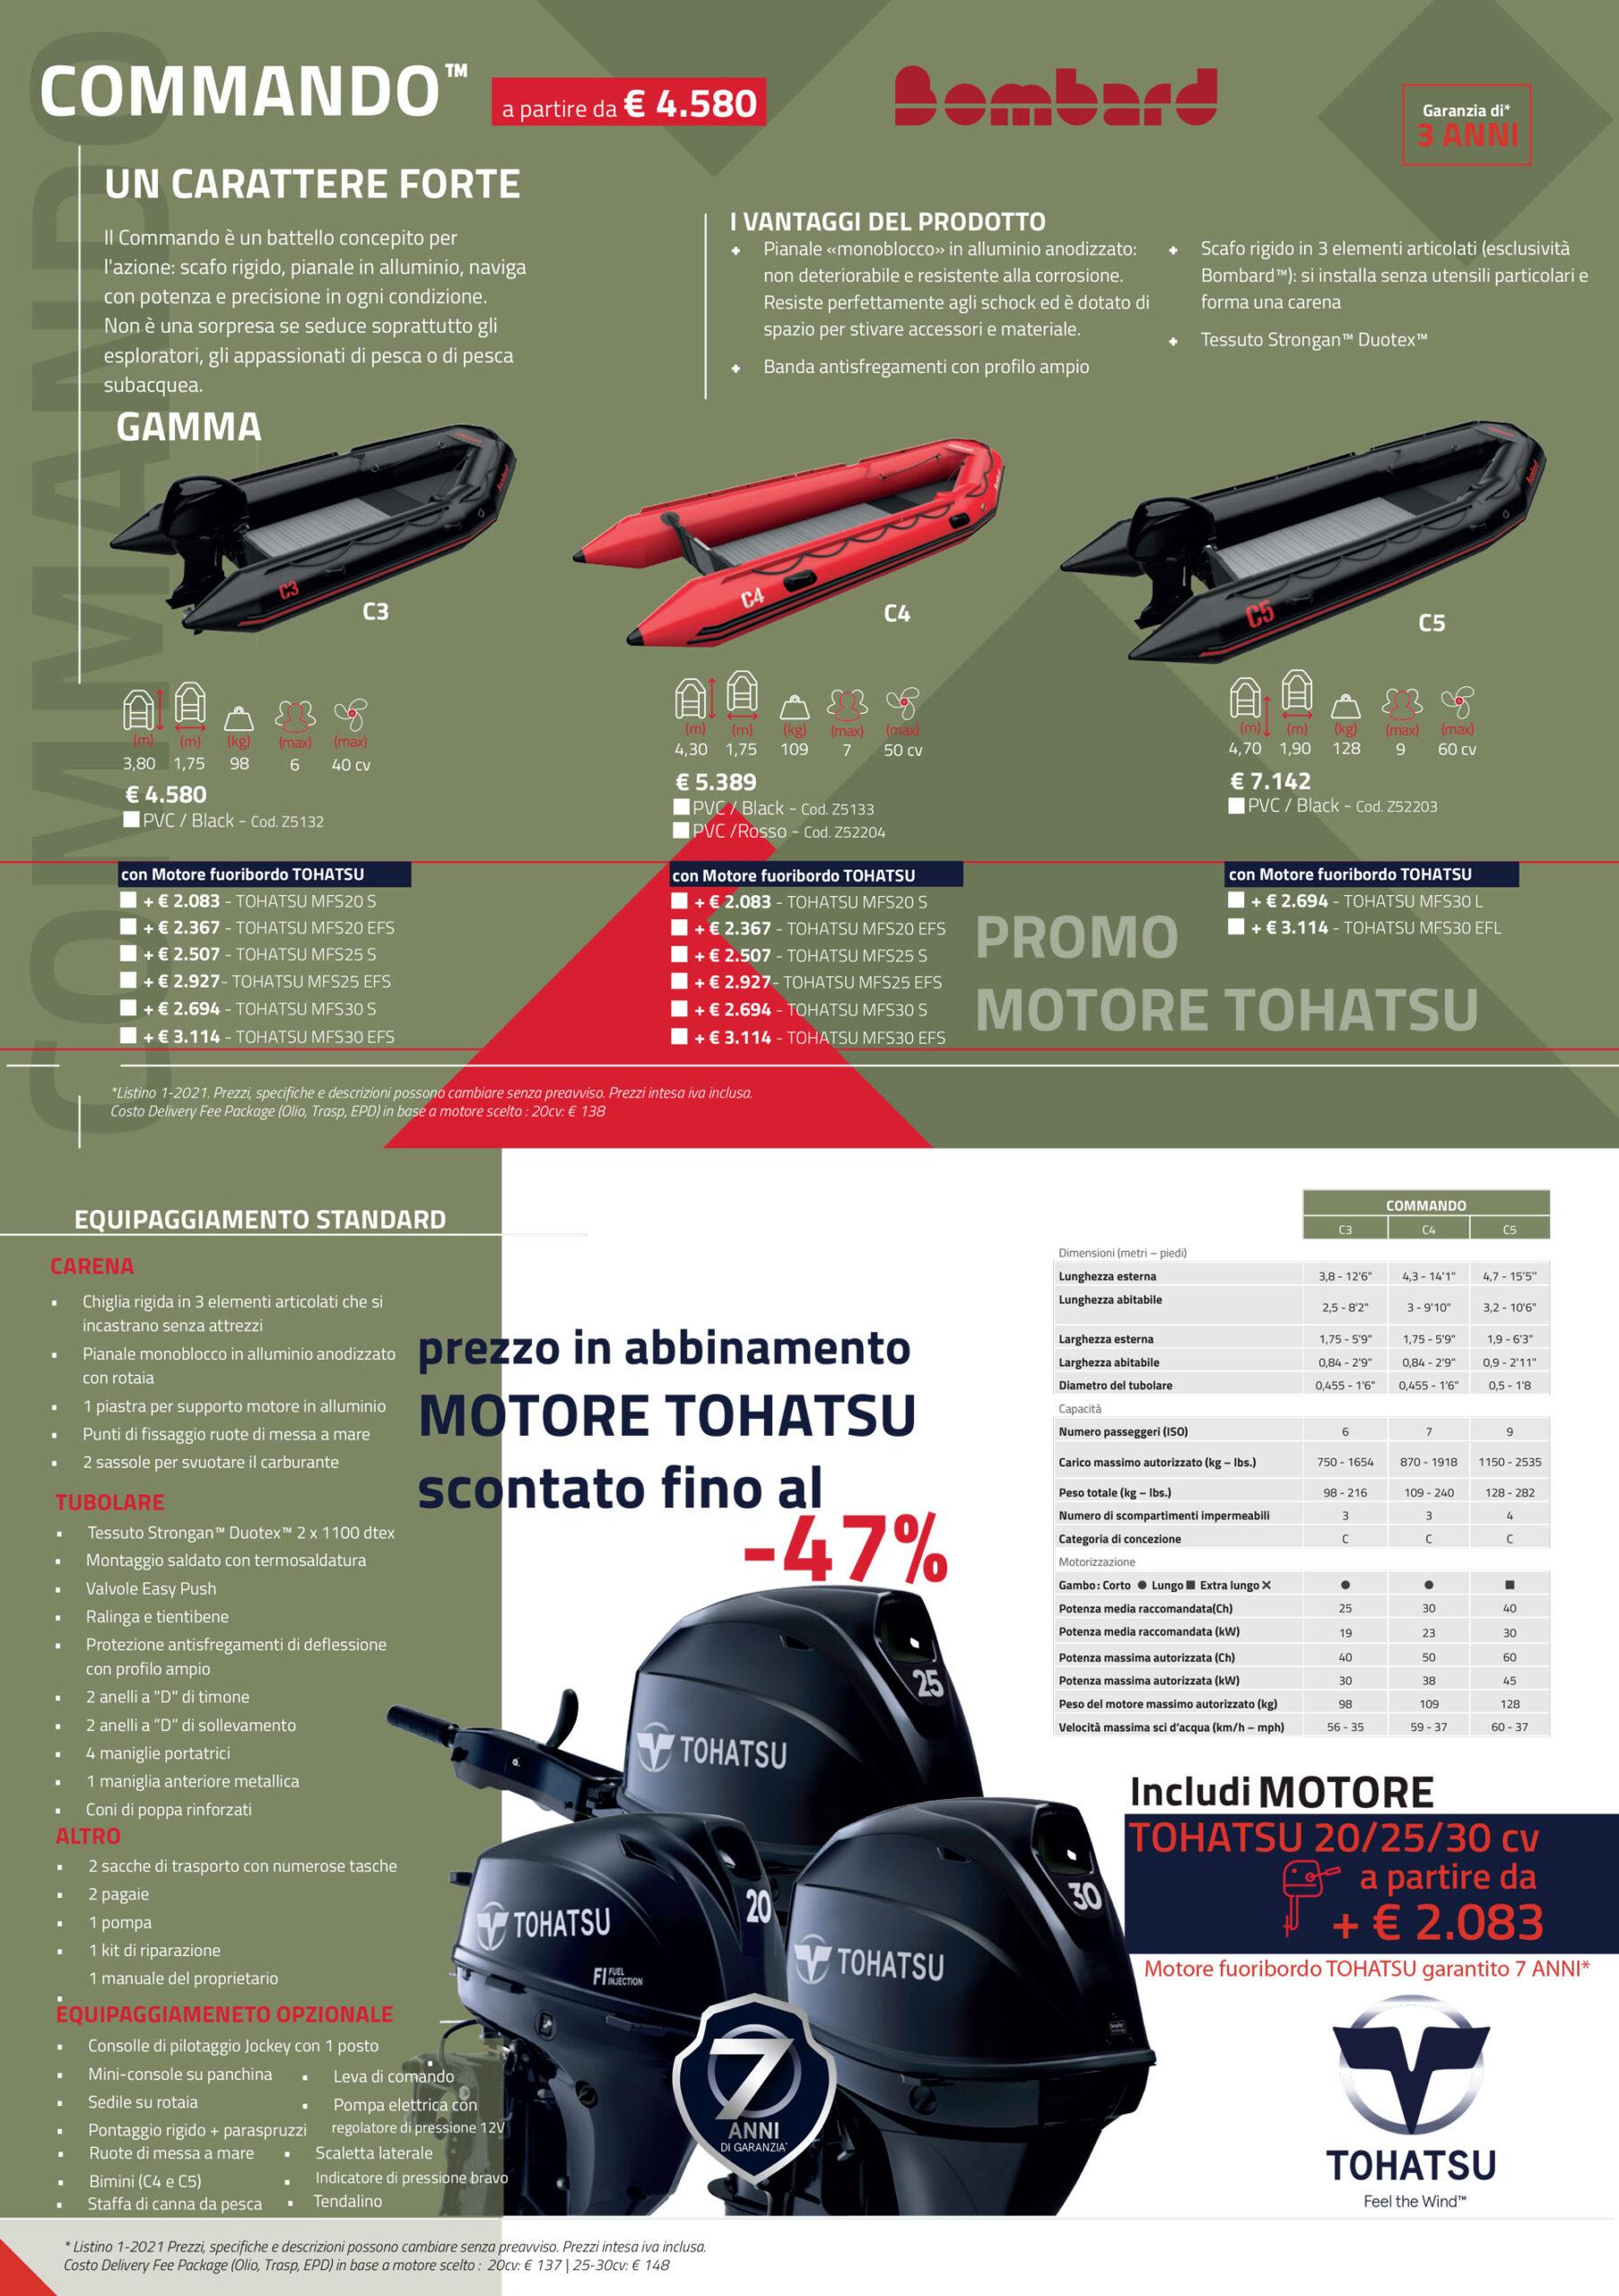 Package Bombard COMMANDO TOHATSU 2021 scaled